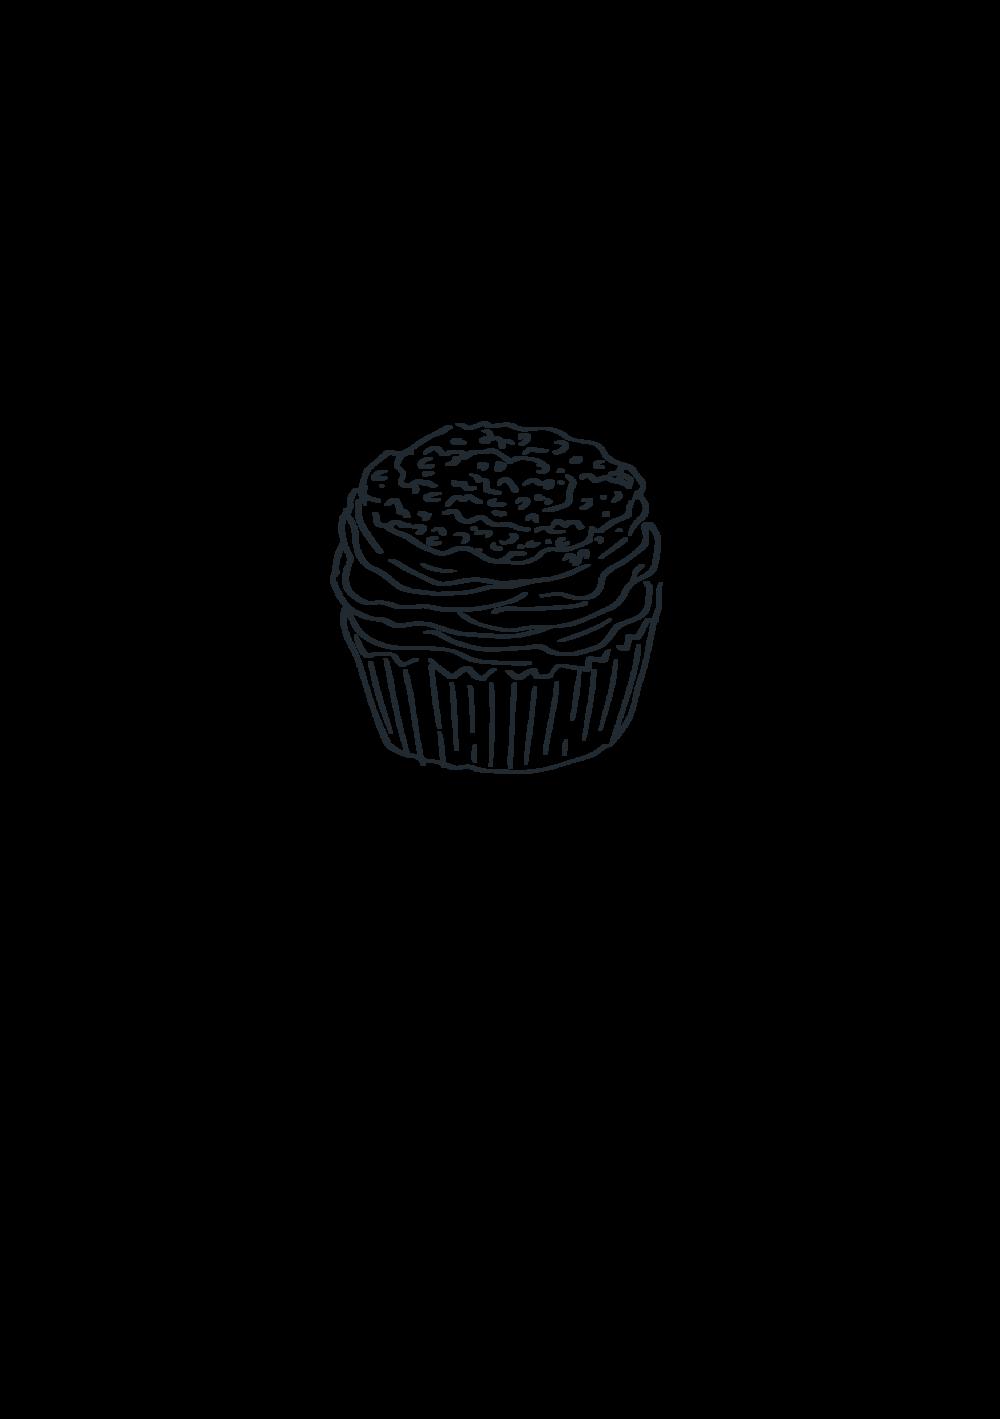 Pophams Bakery_Illustrations_A5_Final-06.png